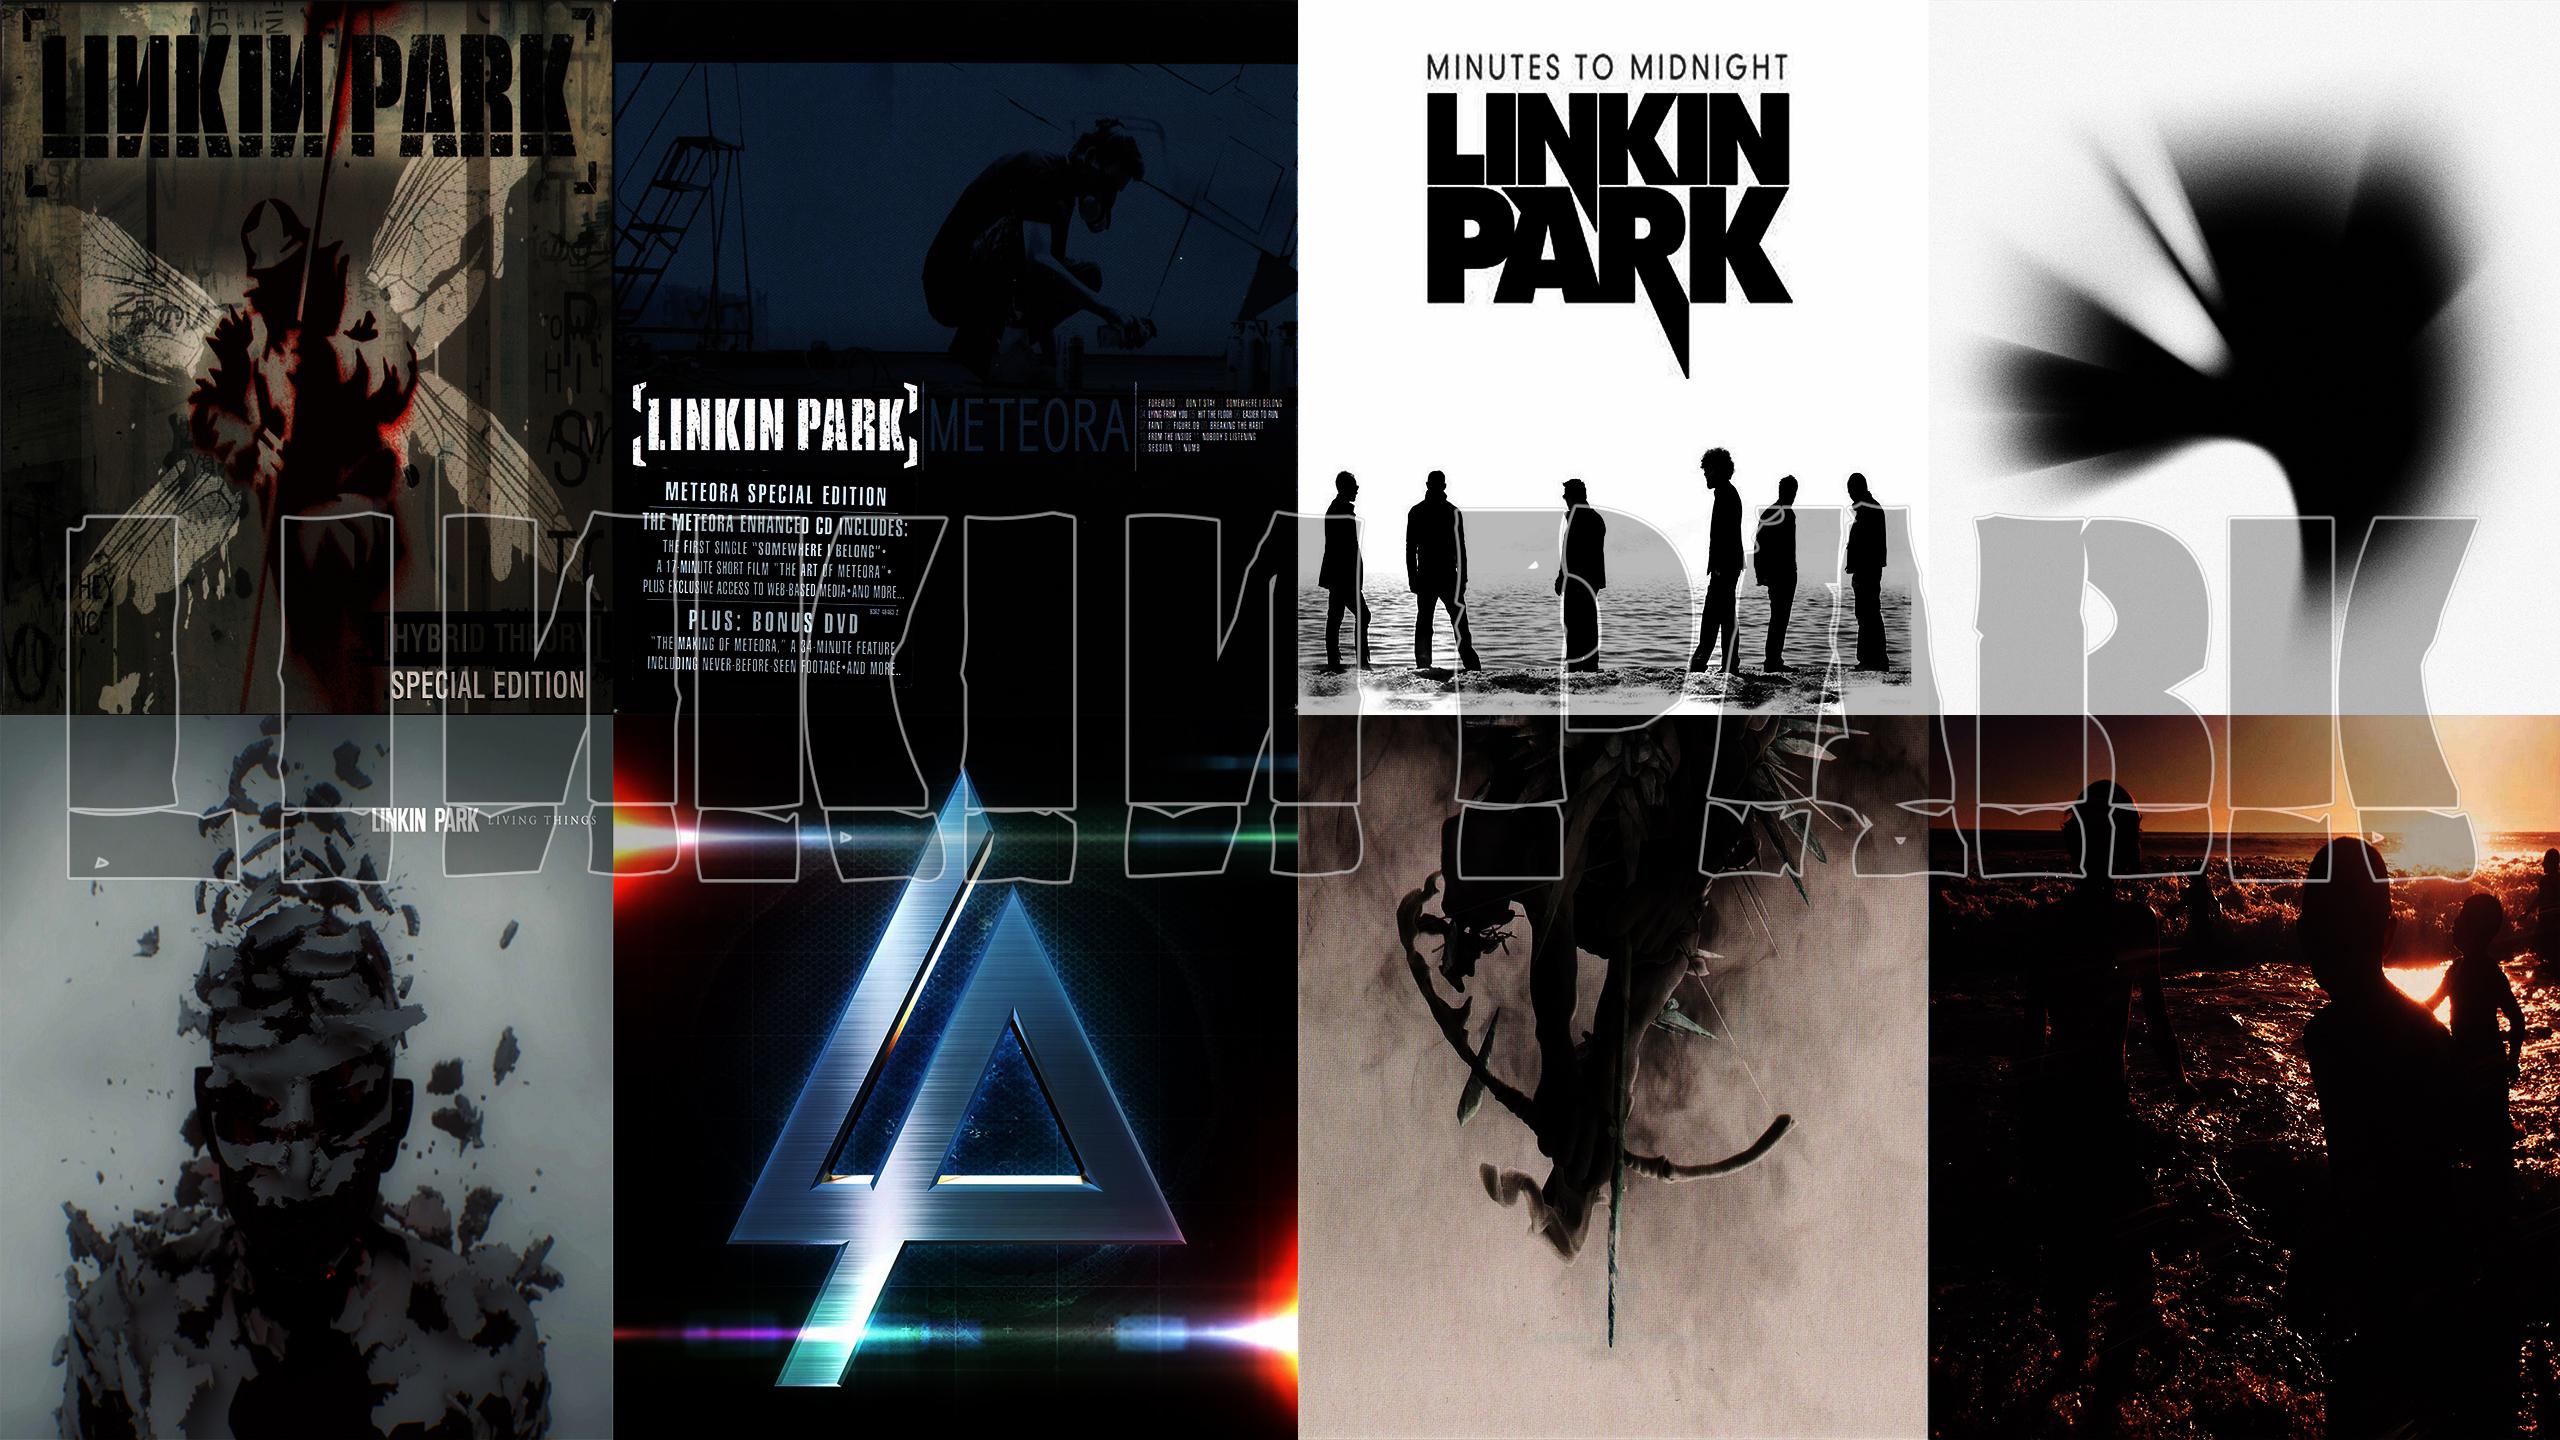 Albunes Linkin Park Hd Wallpaper Background Image 2560x1440